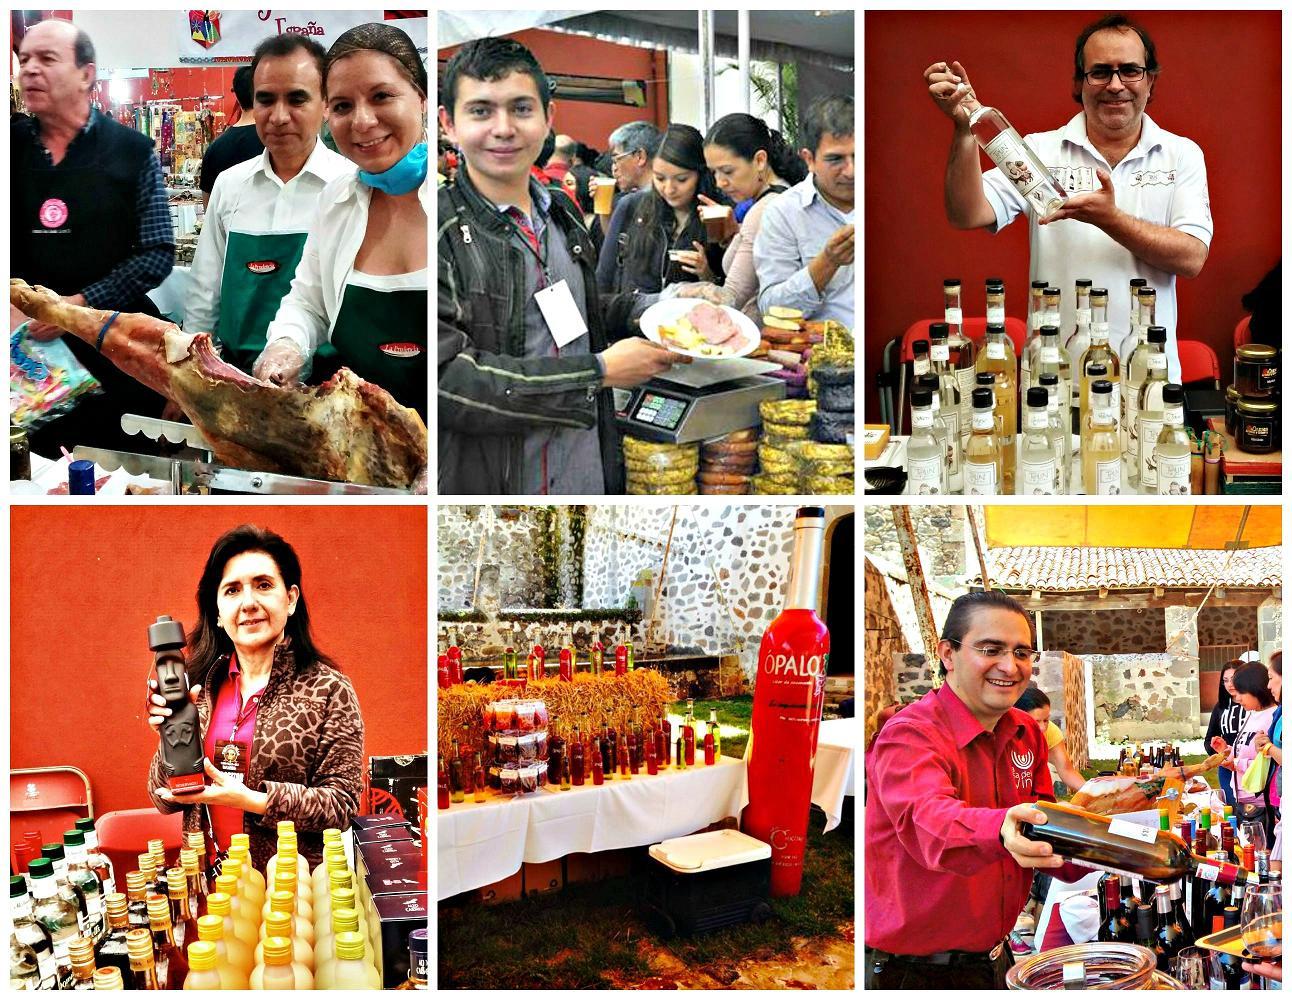 Festival Vino y Exquisiteces 2015 1